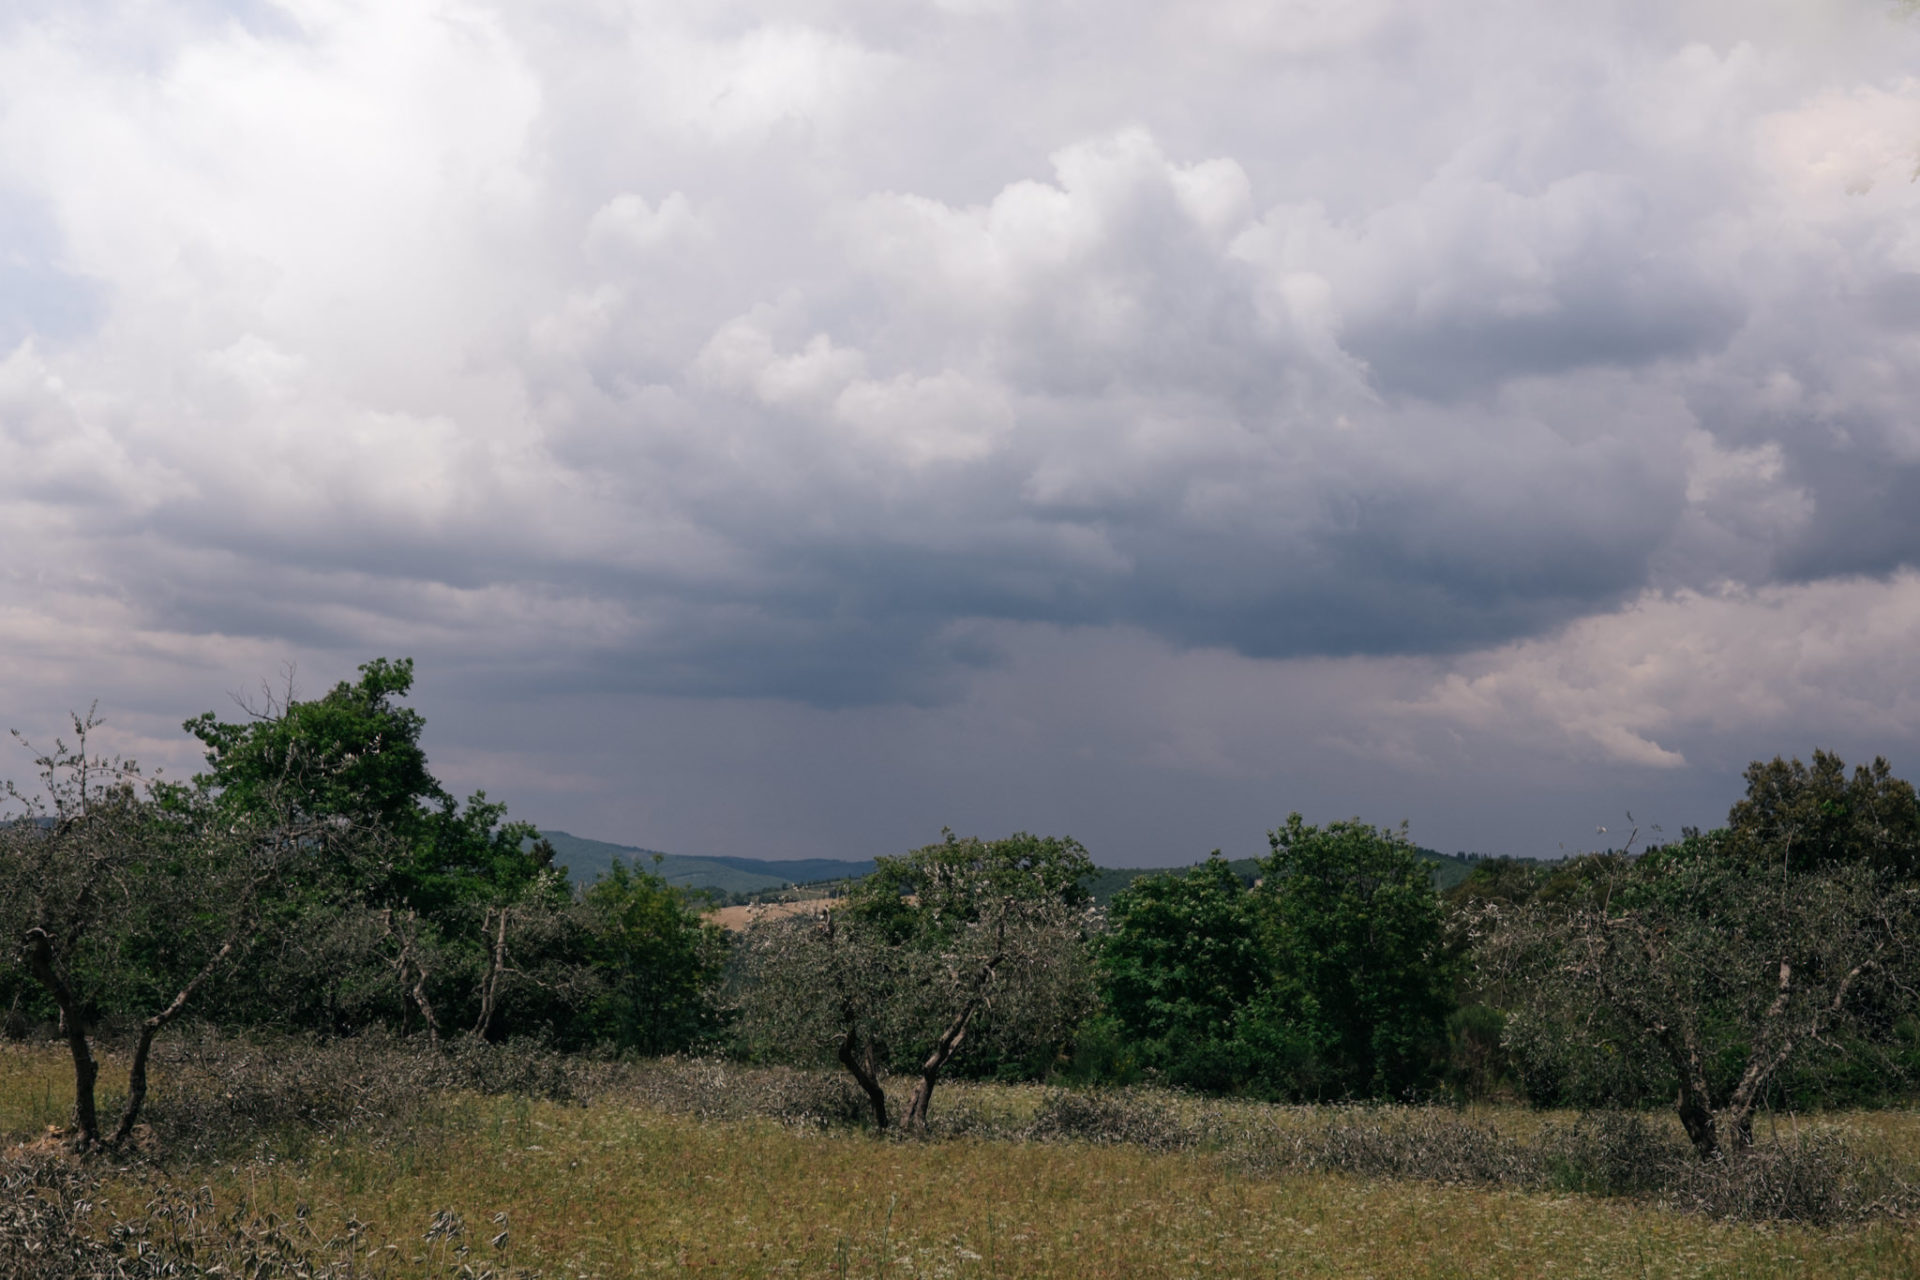 europa roadtrip mit hund-toskana entdecken-hochzeitsfotograf Toskana-chianti urlaub